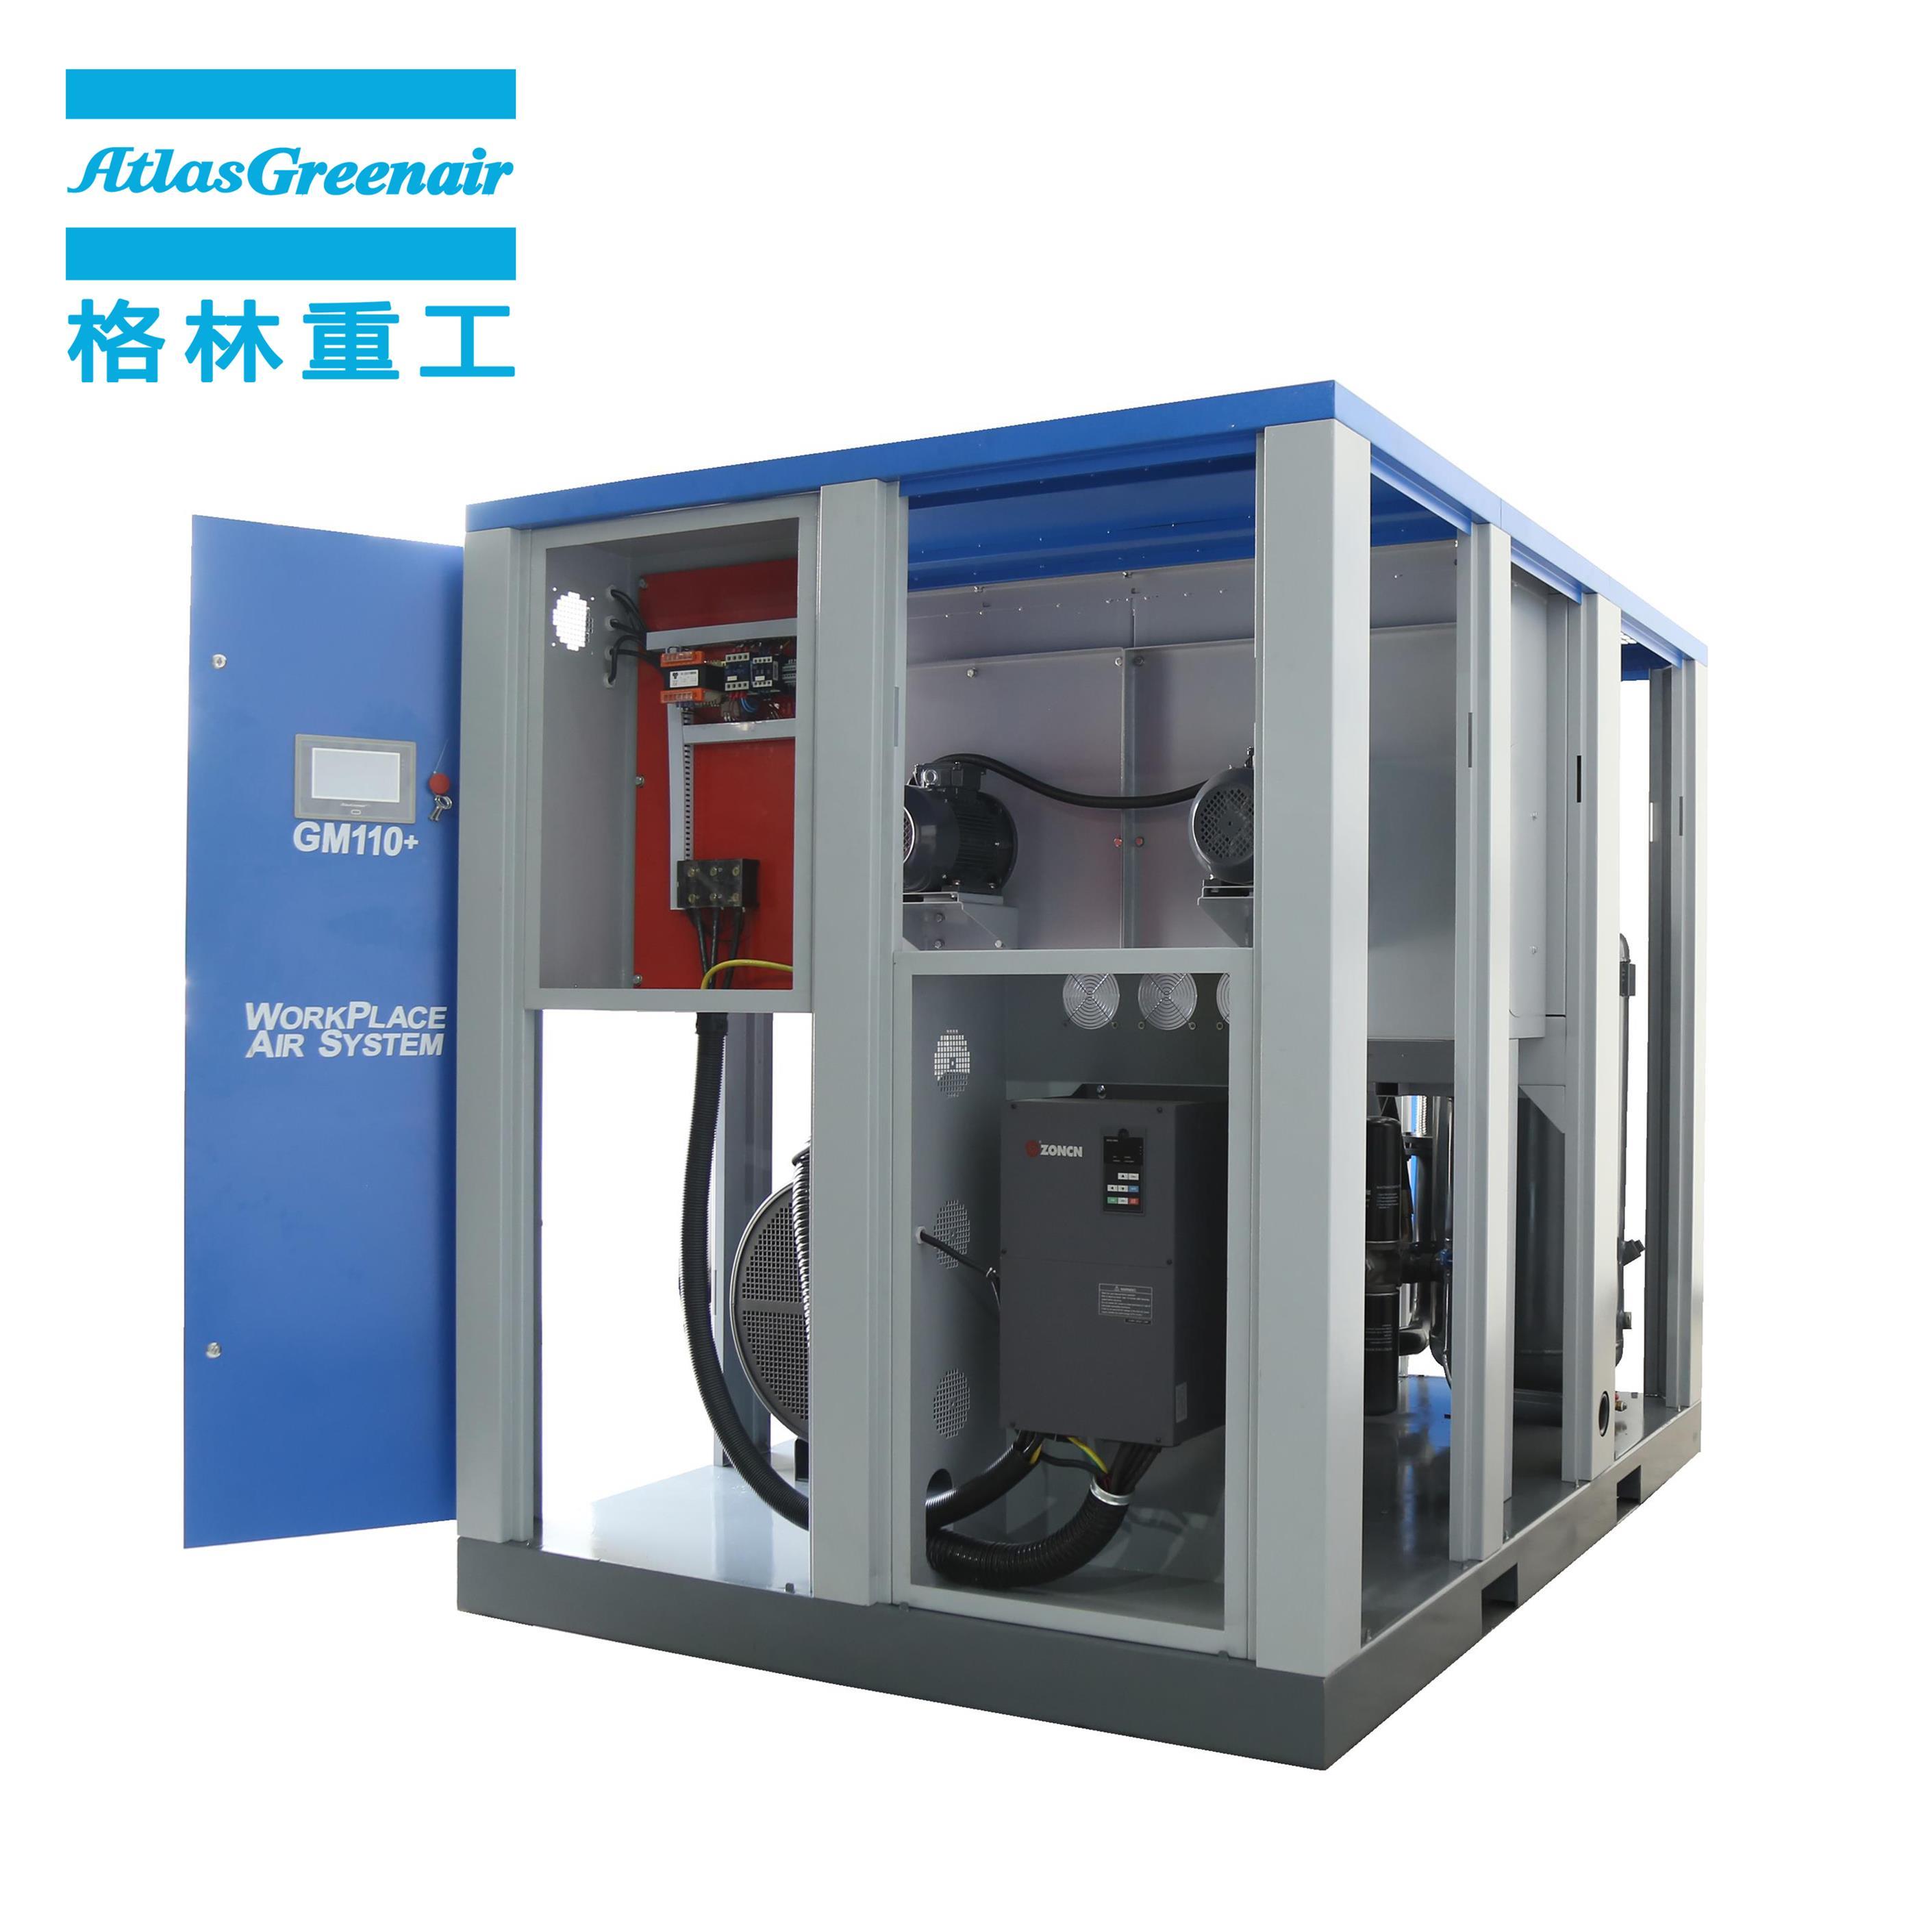 Atlas Greenair Screw Air Compressor variable speed air compressor supplier for sale-1